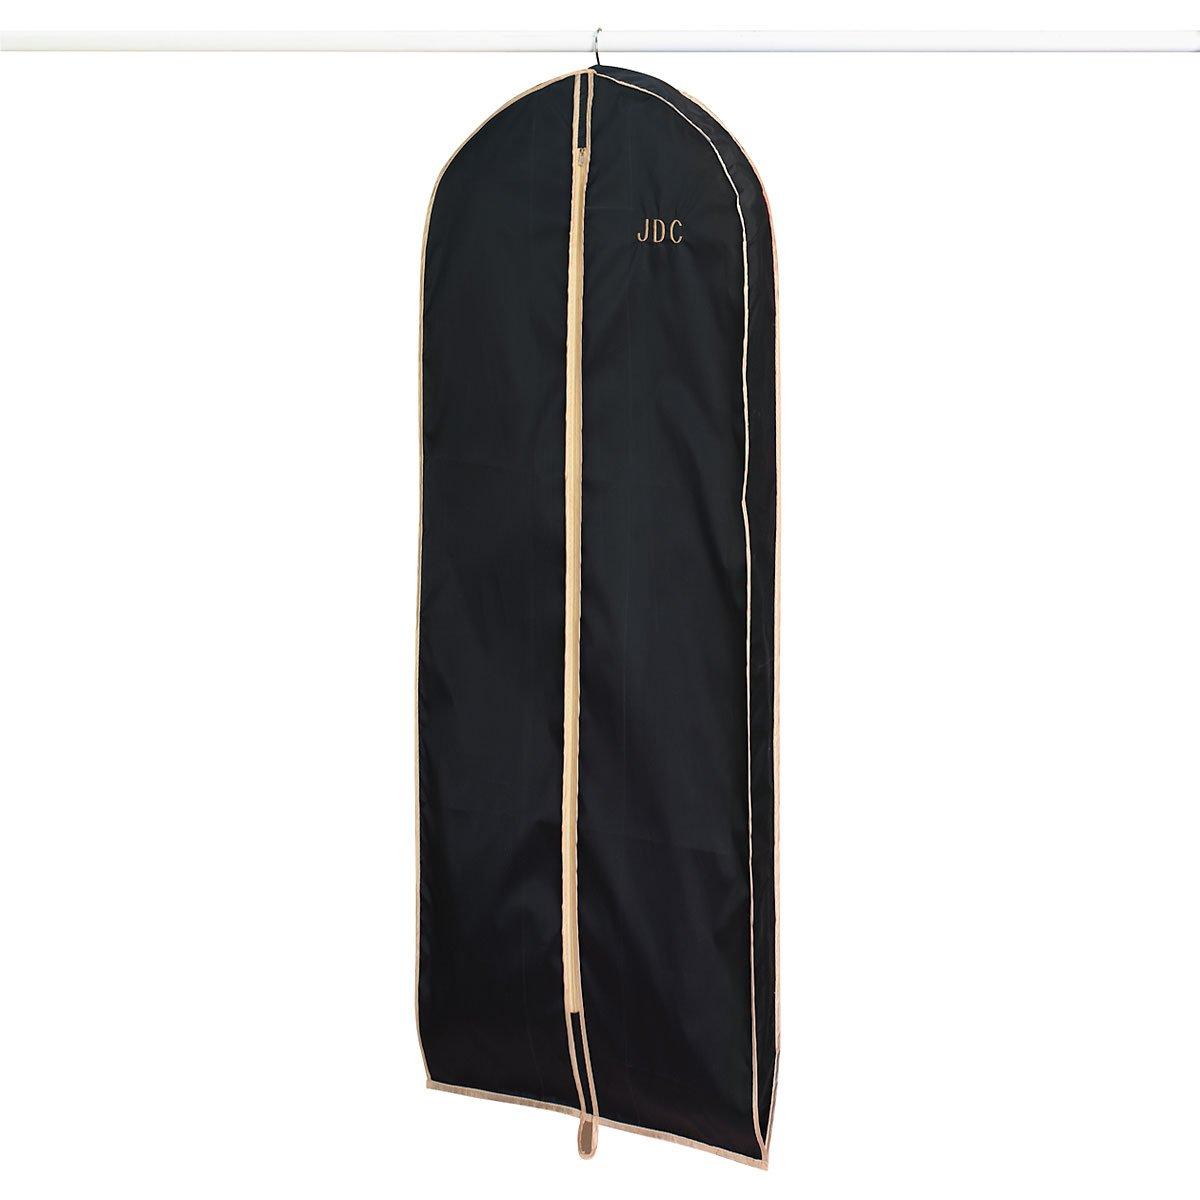 Monogram Garment Travel Bag, Polyester, Suit/Dress Bags 810292-g